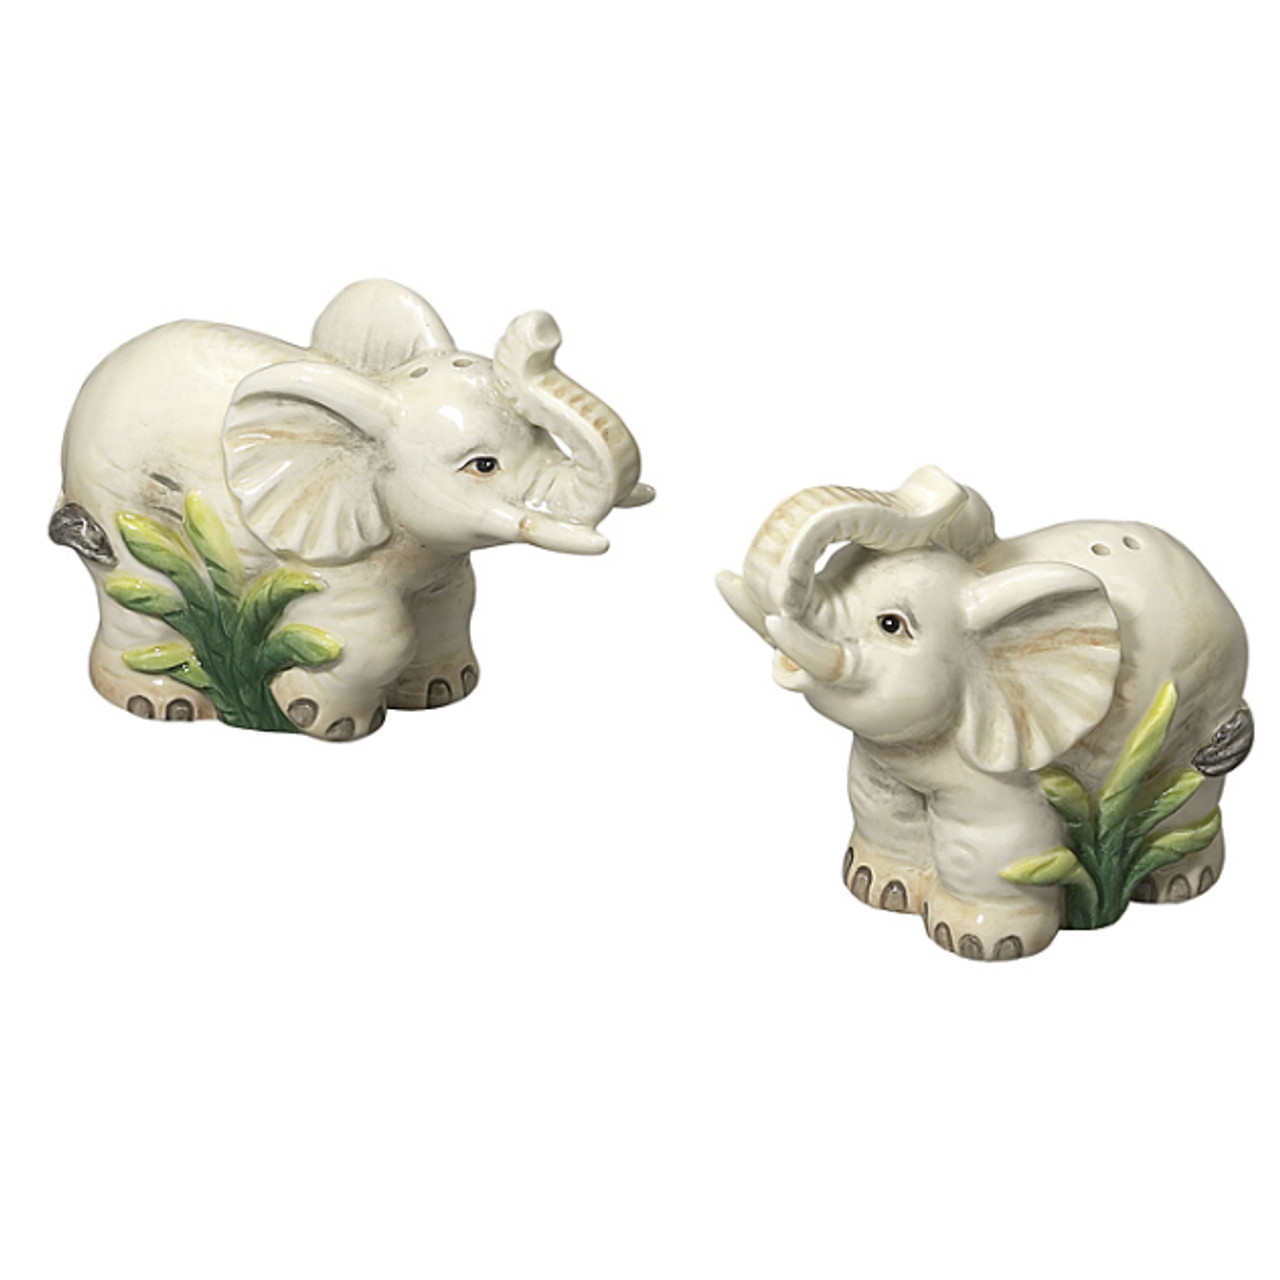 Andrea By Sadek Ceramic Elephant Grey Salt Pepper Shakers Hand Painted New